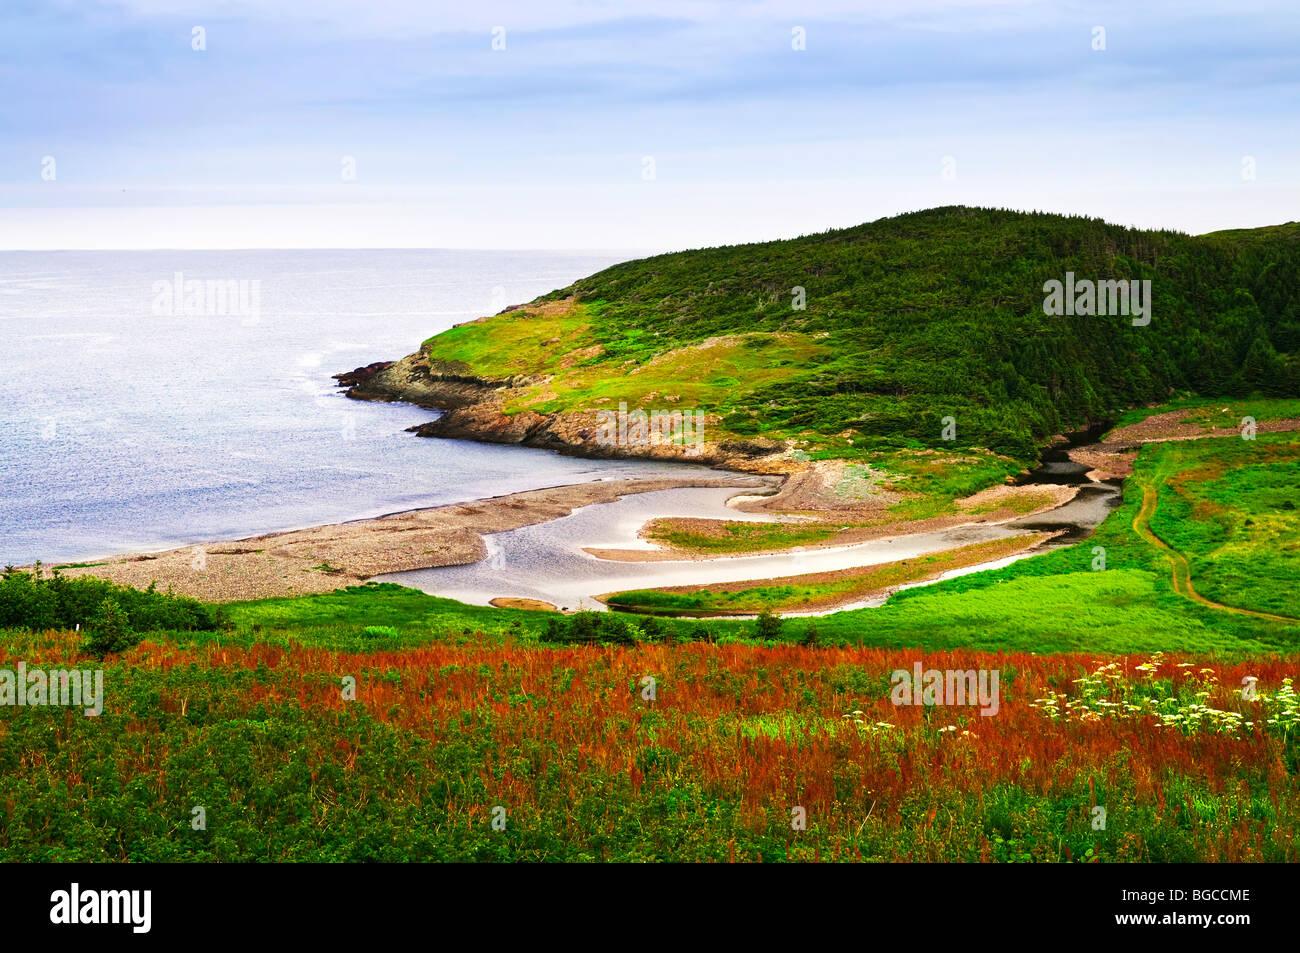 Scenic coastal view of rocky Atlantic shore in Newfoundland, Canada - Stock Image